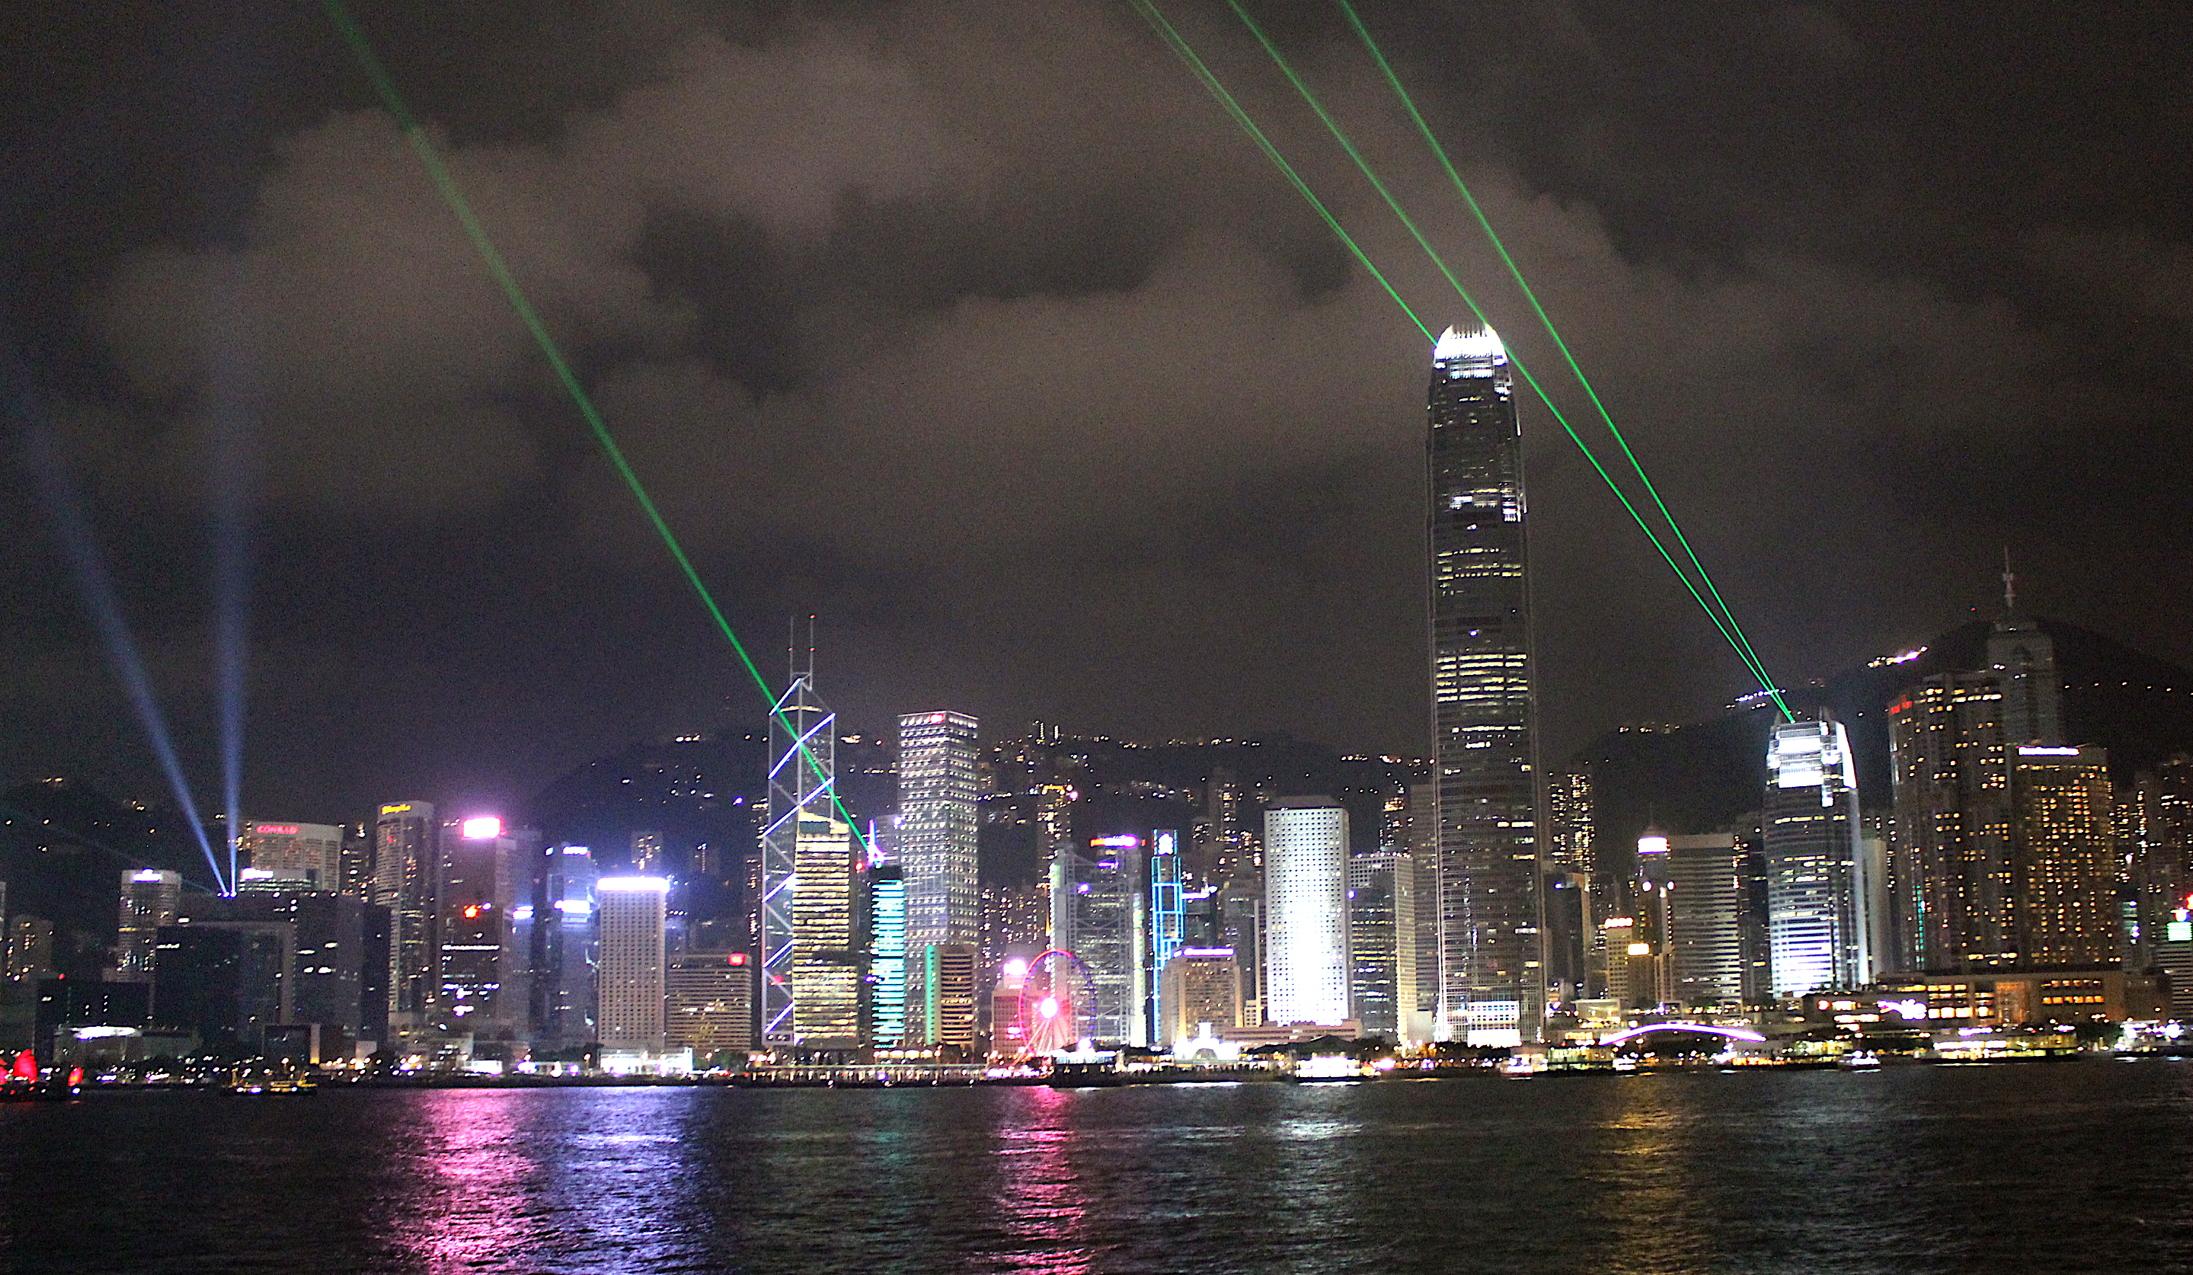 A Symphony of Lights Show